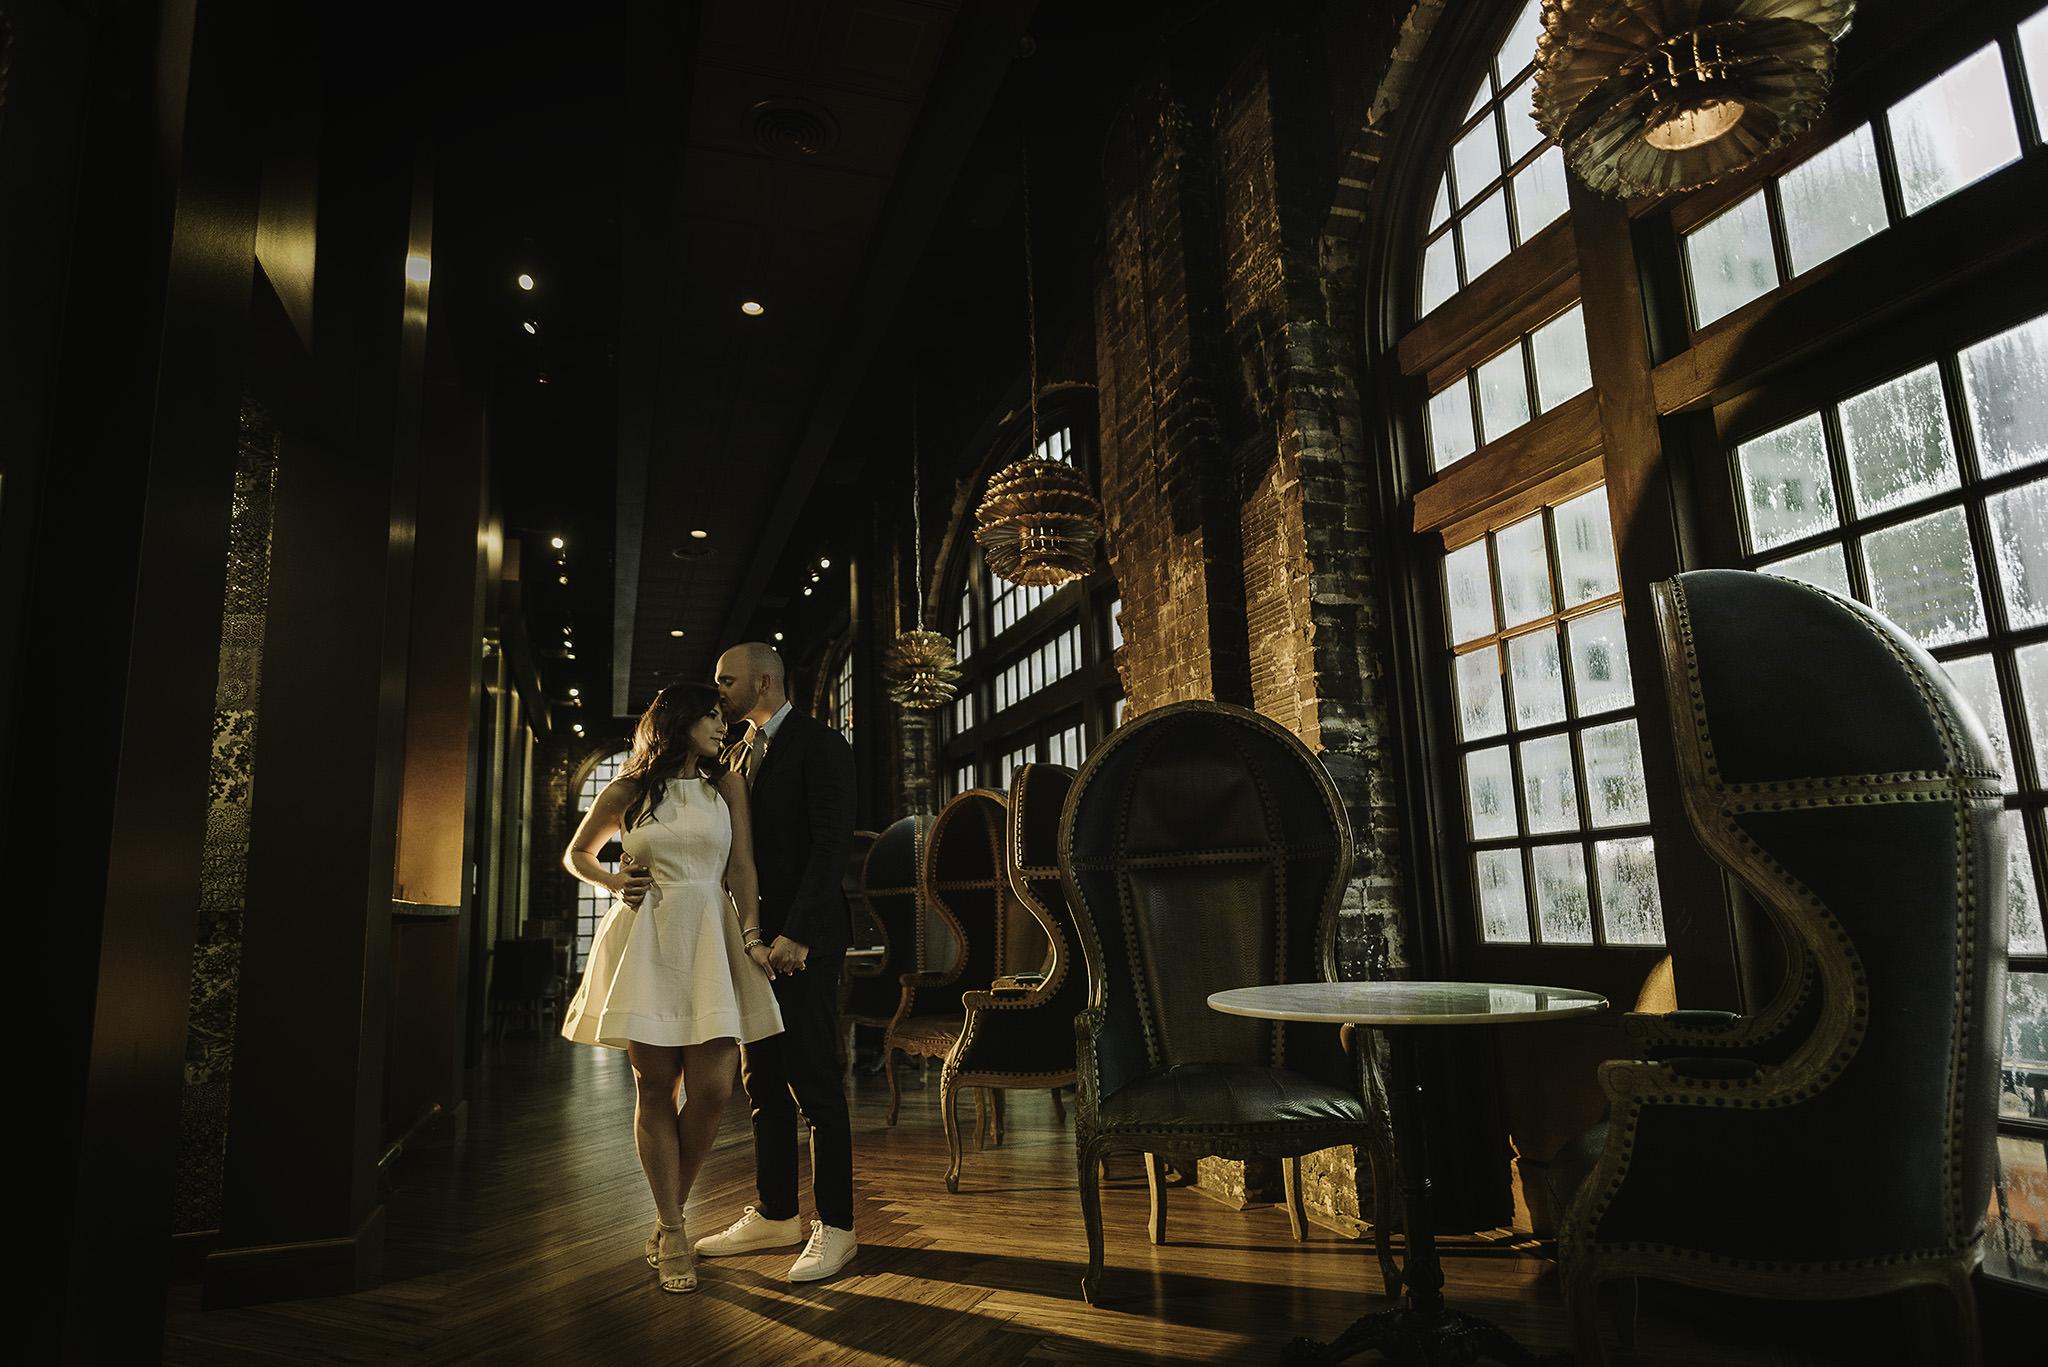 Houston-Lawless-Spirits-kitchen-crystal-ballroom-rice-initmate-historic-lifestyle-engagement-photography-session